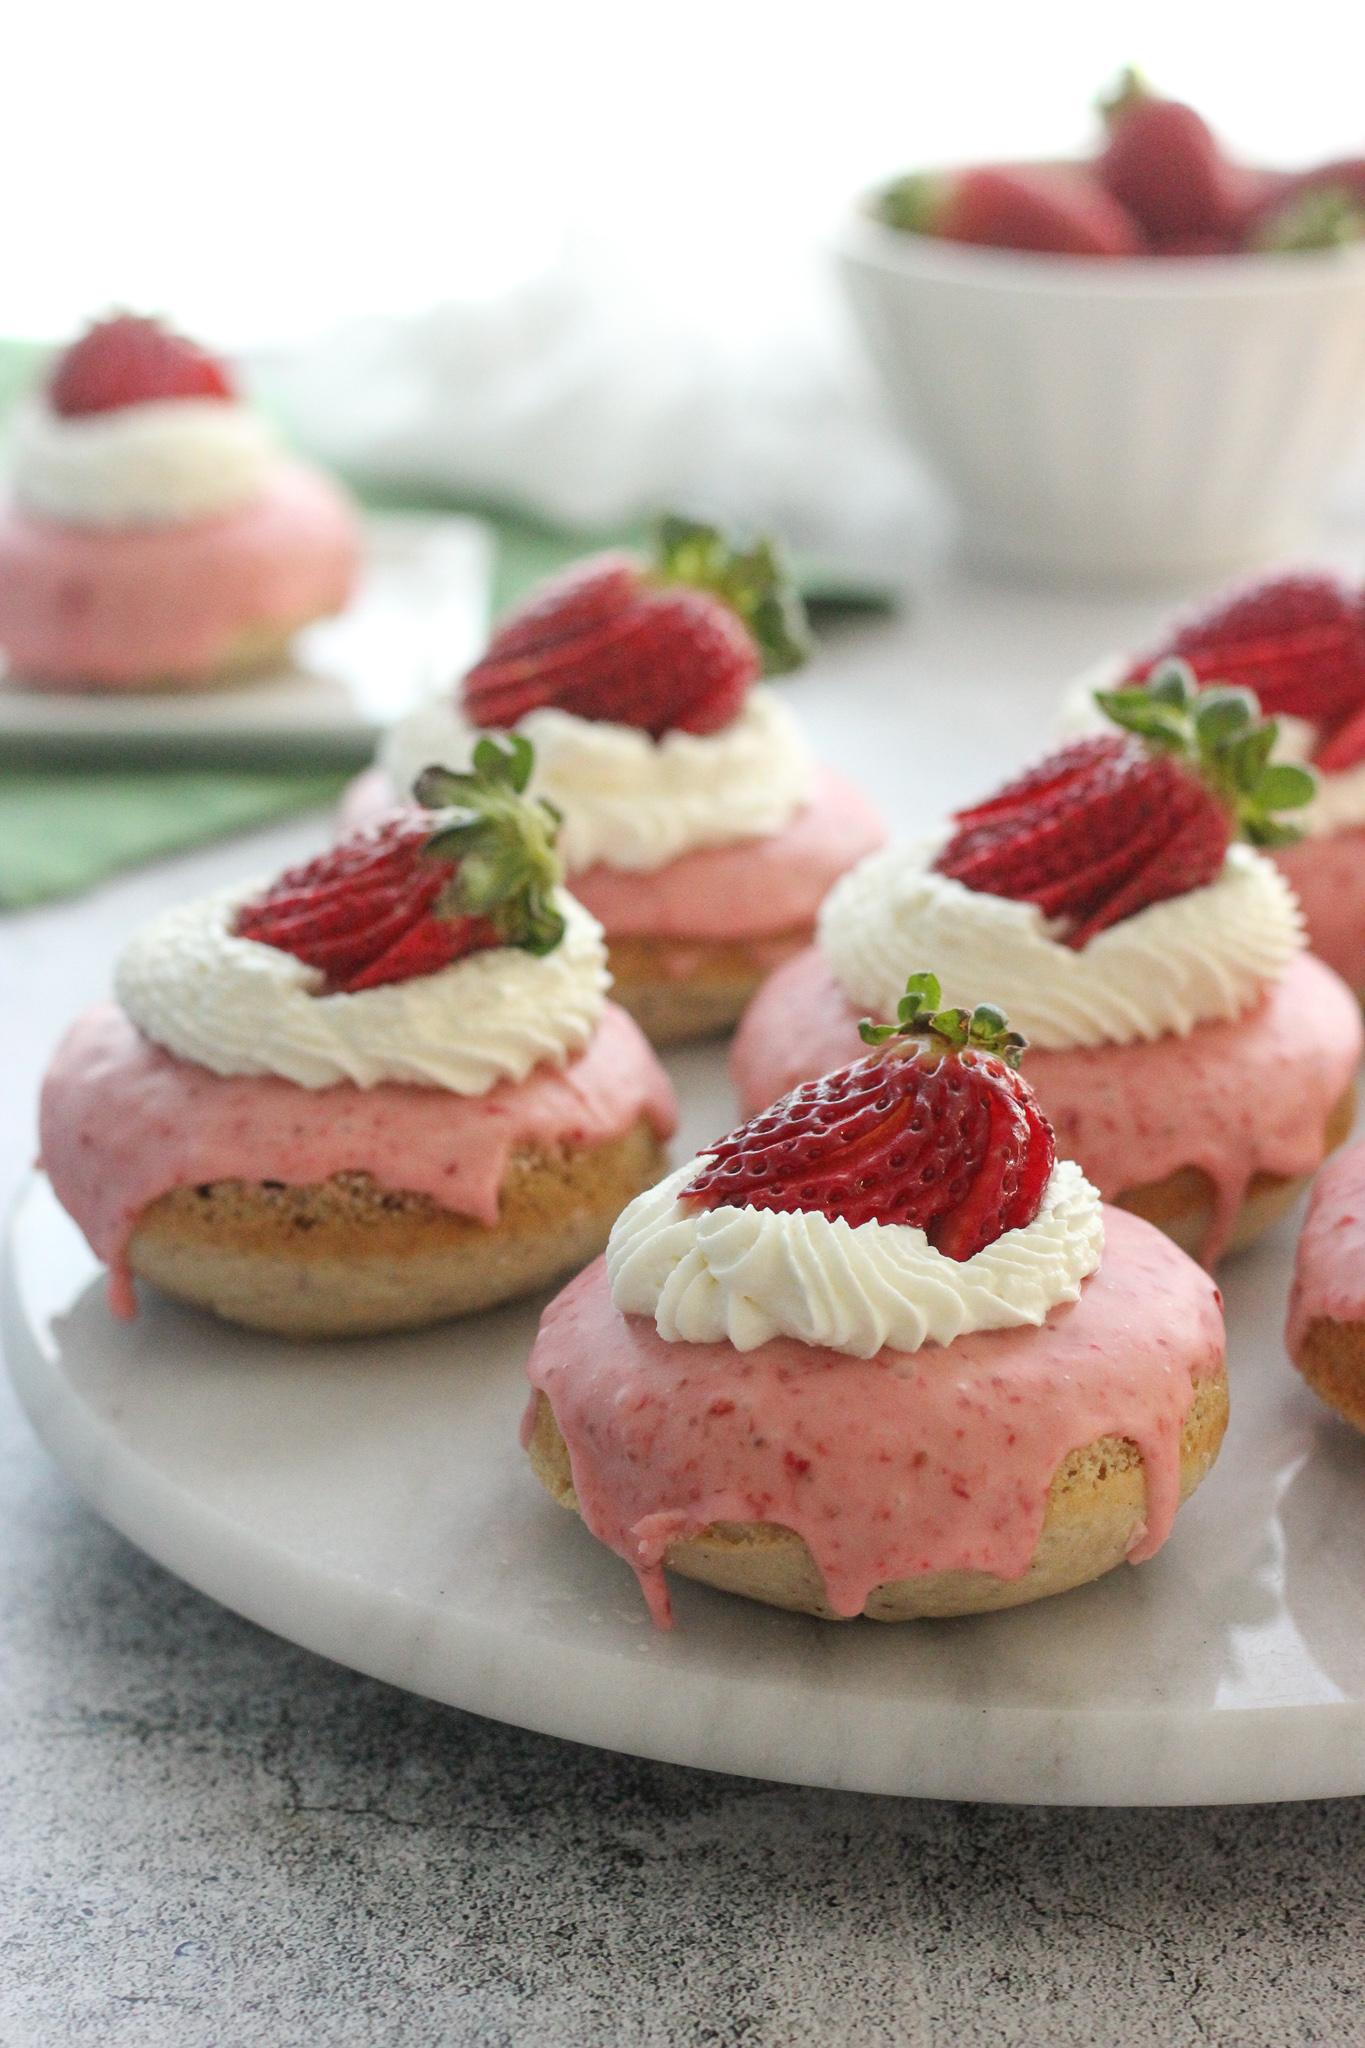 Gluten Free Strawberry Shortcake Buttermilk Doughnuts